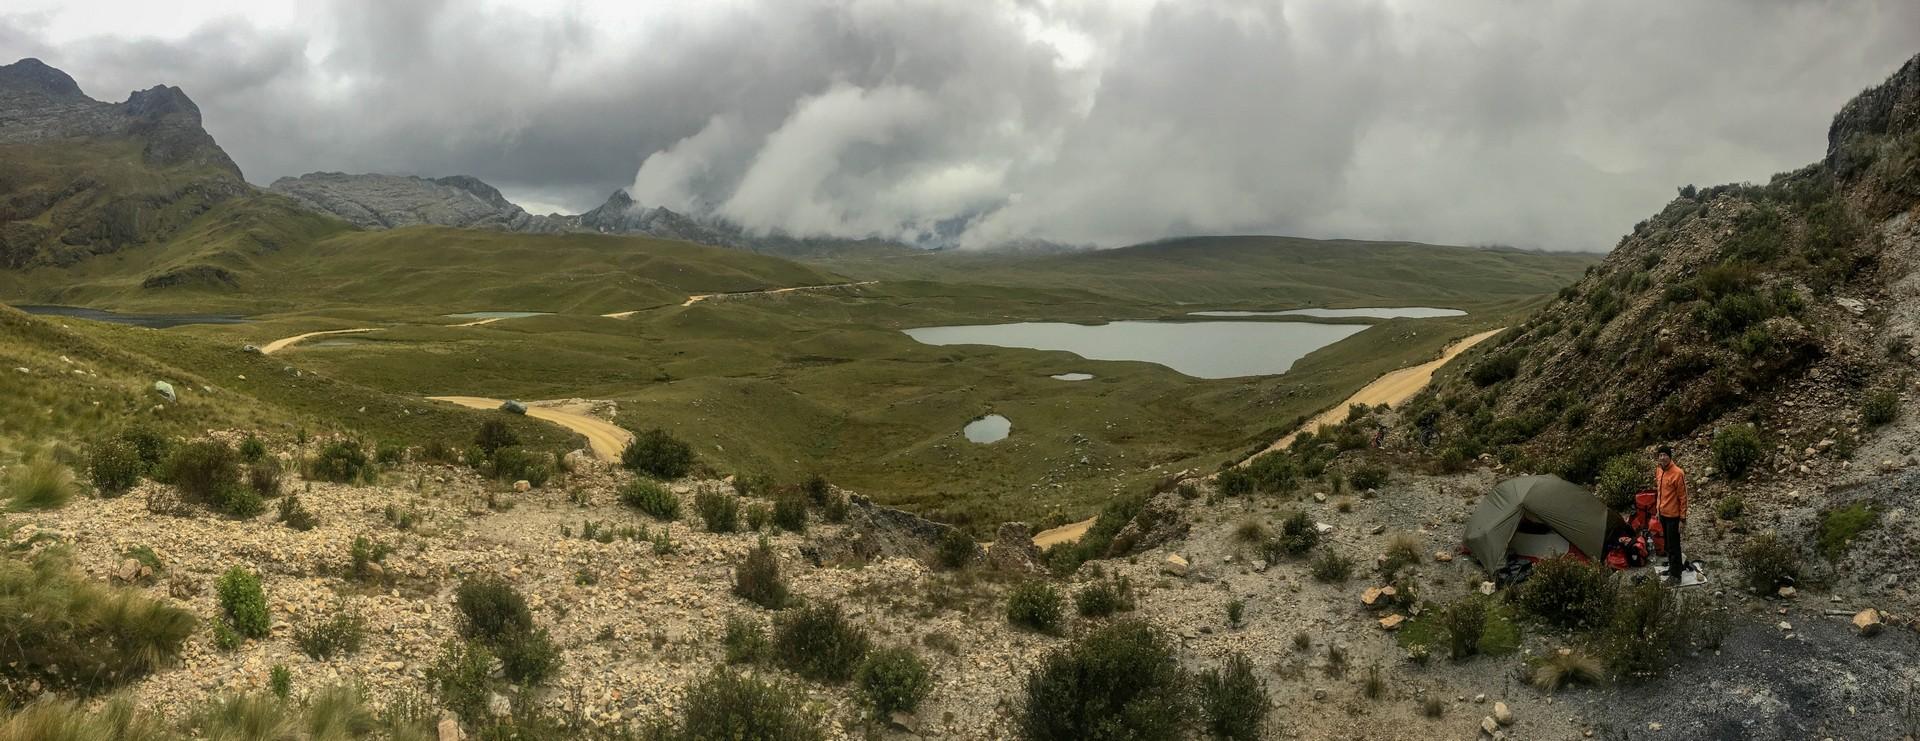 2019-04-30 Huamachuco_Laguna Larga-77